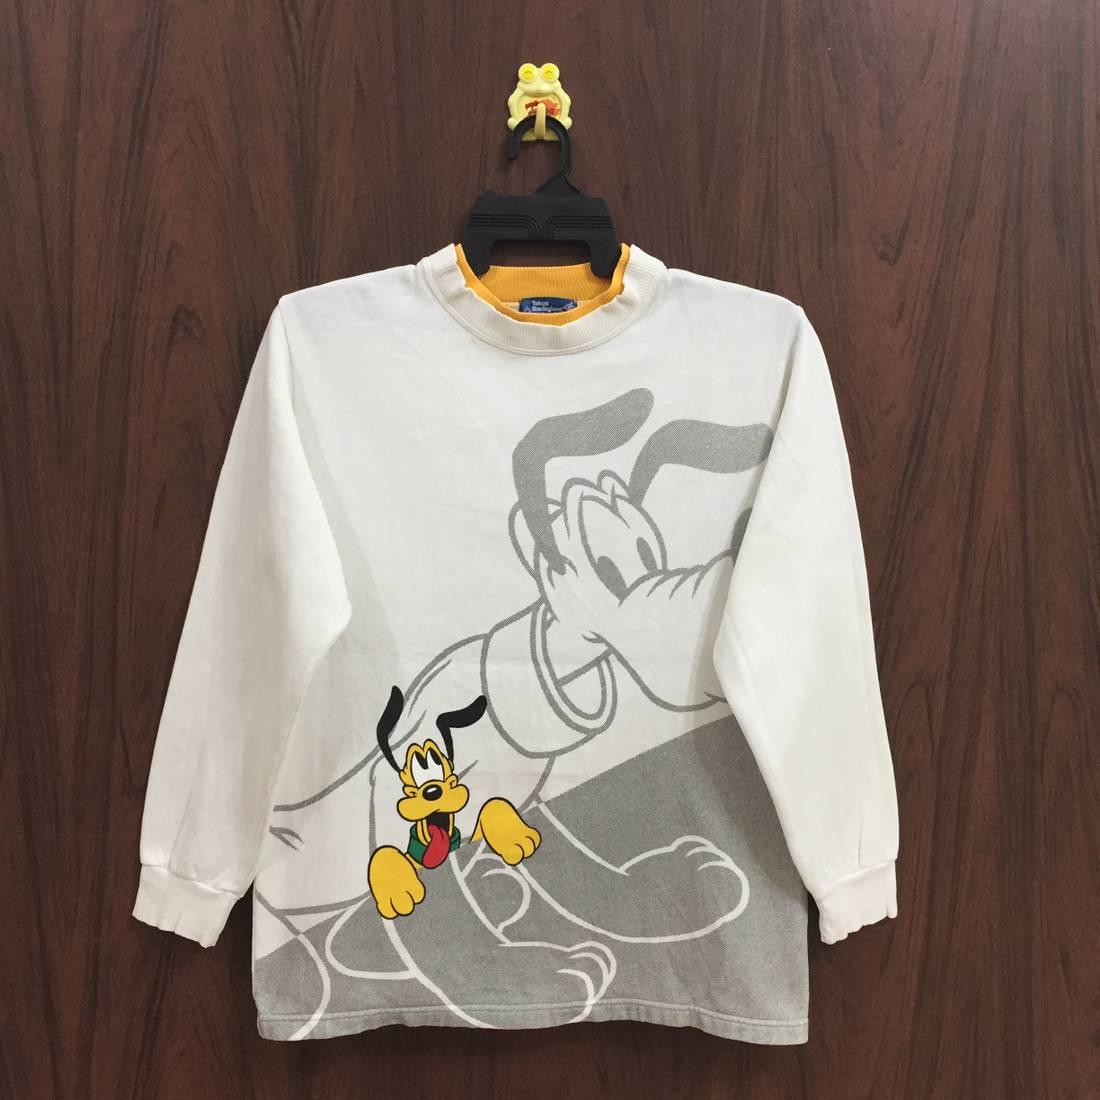 Vintage Mickey Mouse and pluto walt disney crewneck big logo sweatshirt jumper jacket L size